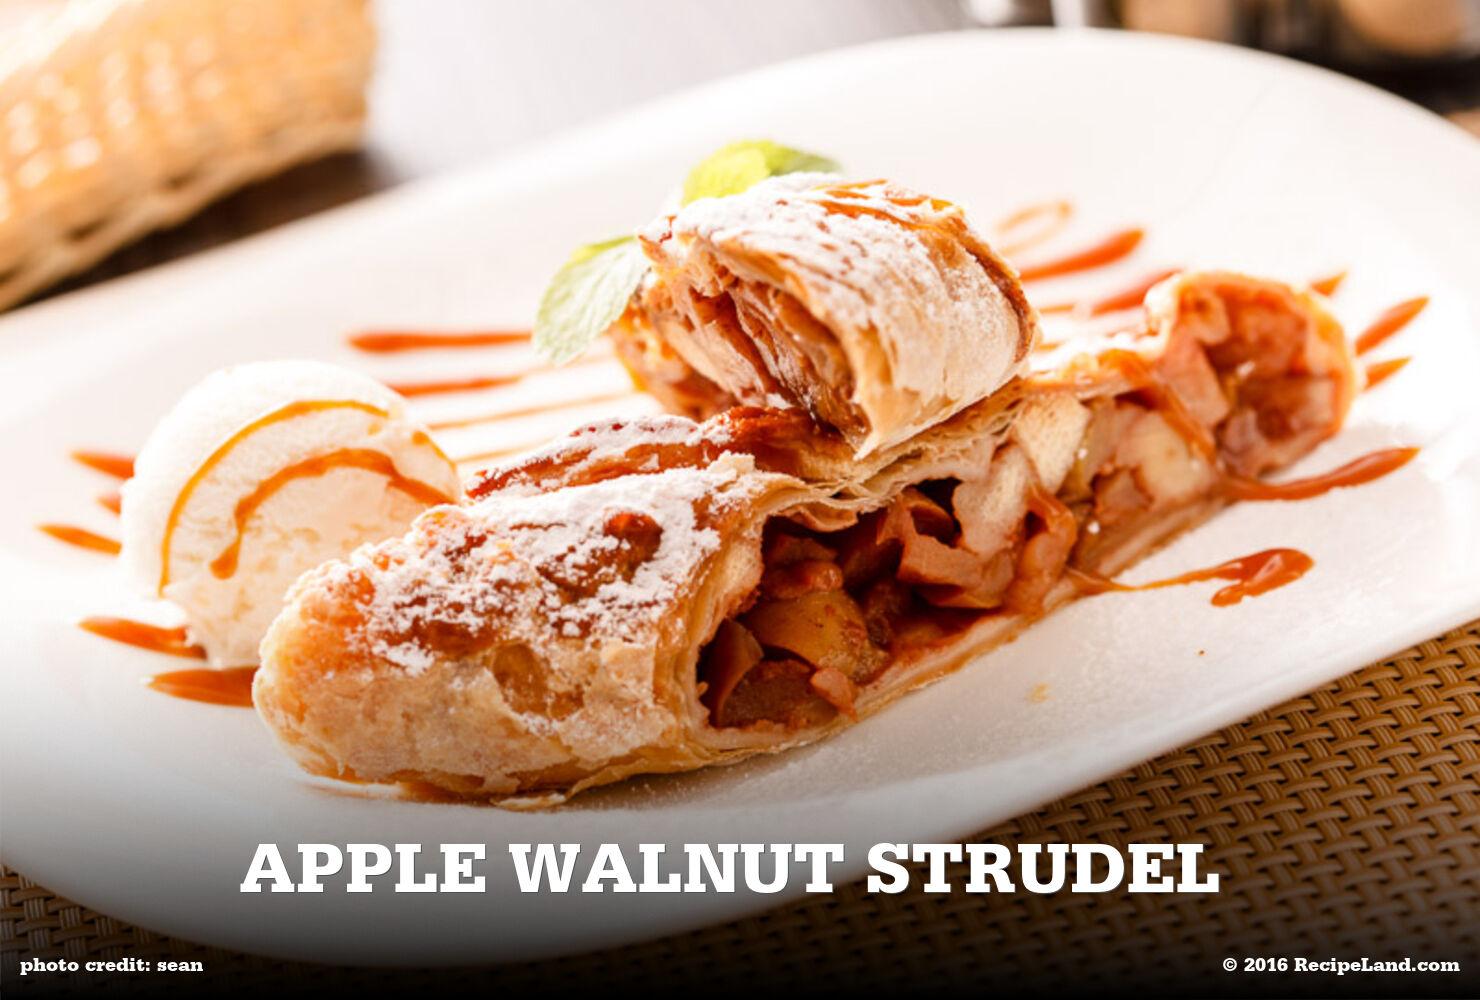 Apple Walnut Strudel